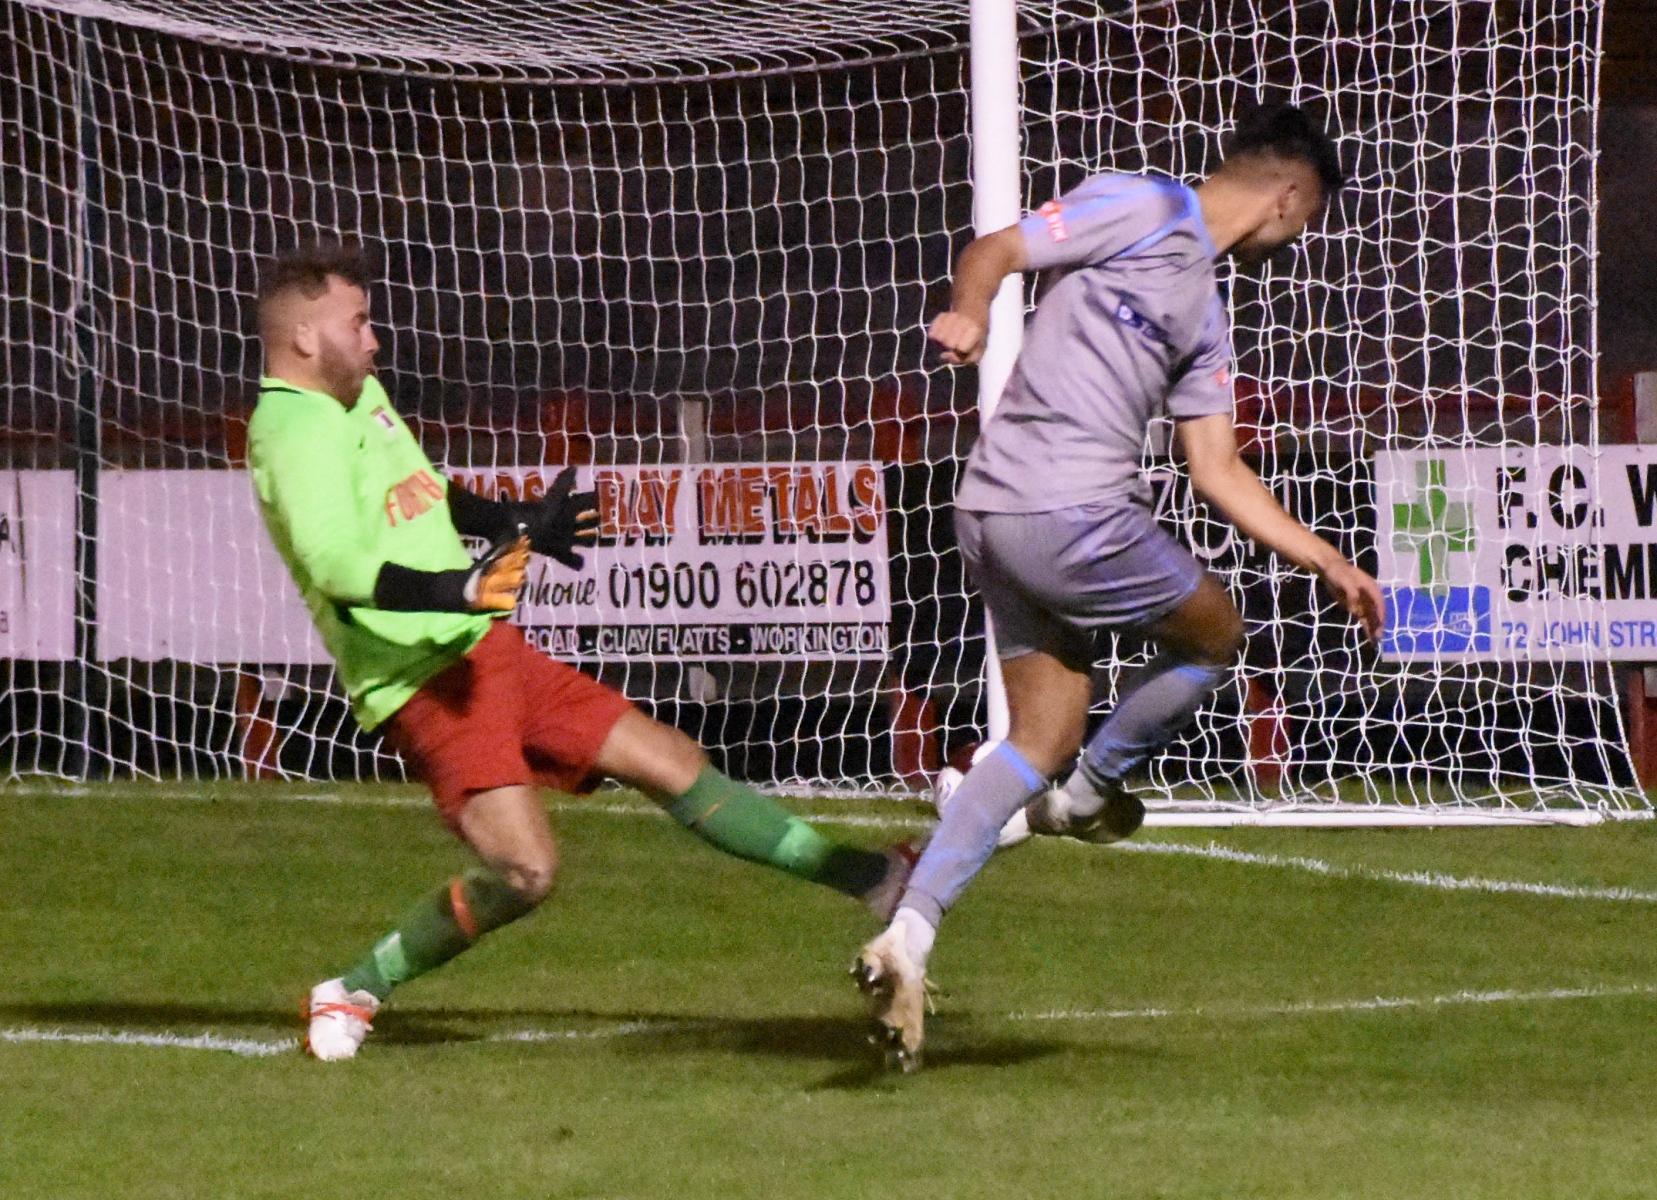 Nathan-Waterston-puts-The-Reds-3-0-up-Ben-Challis